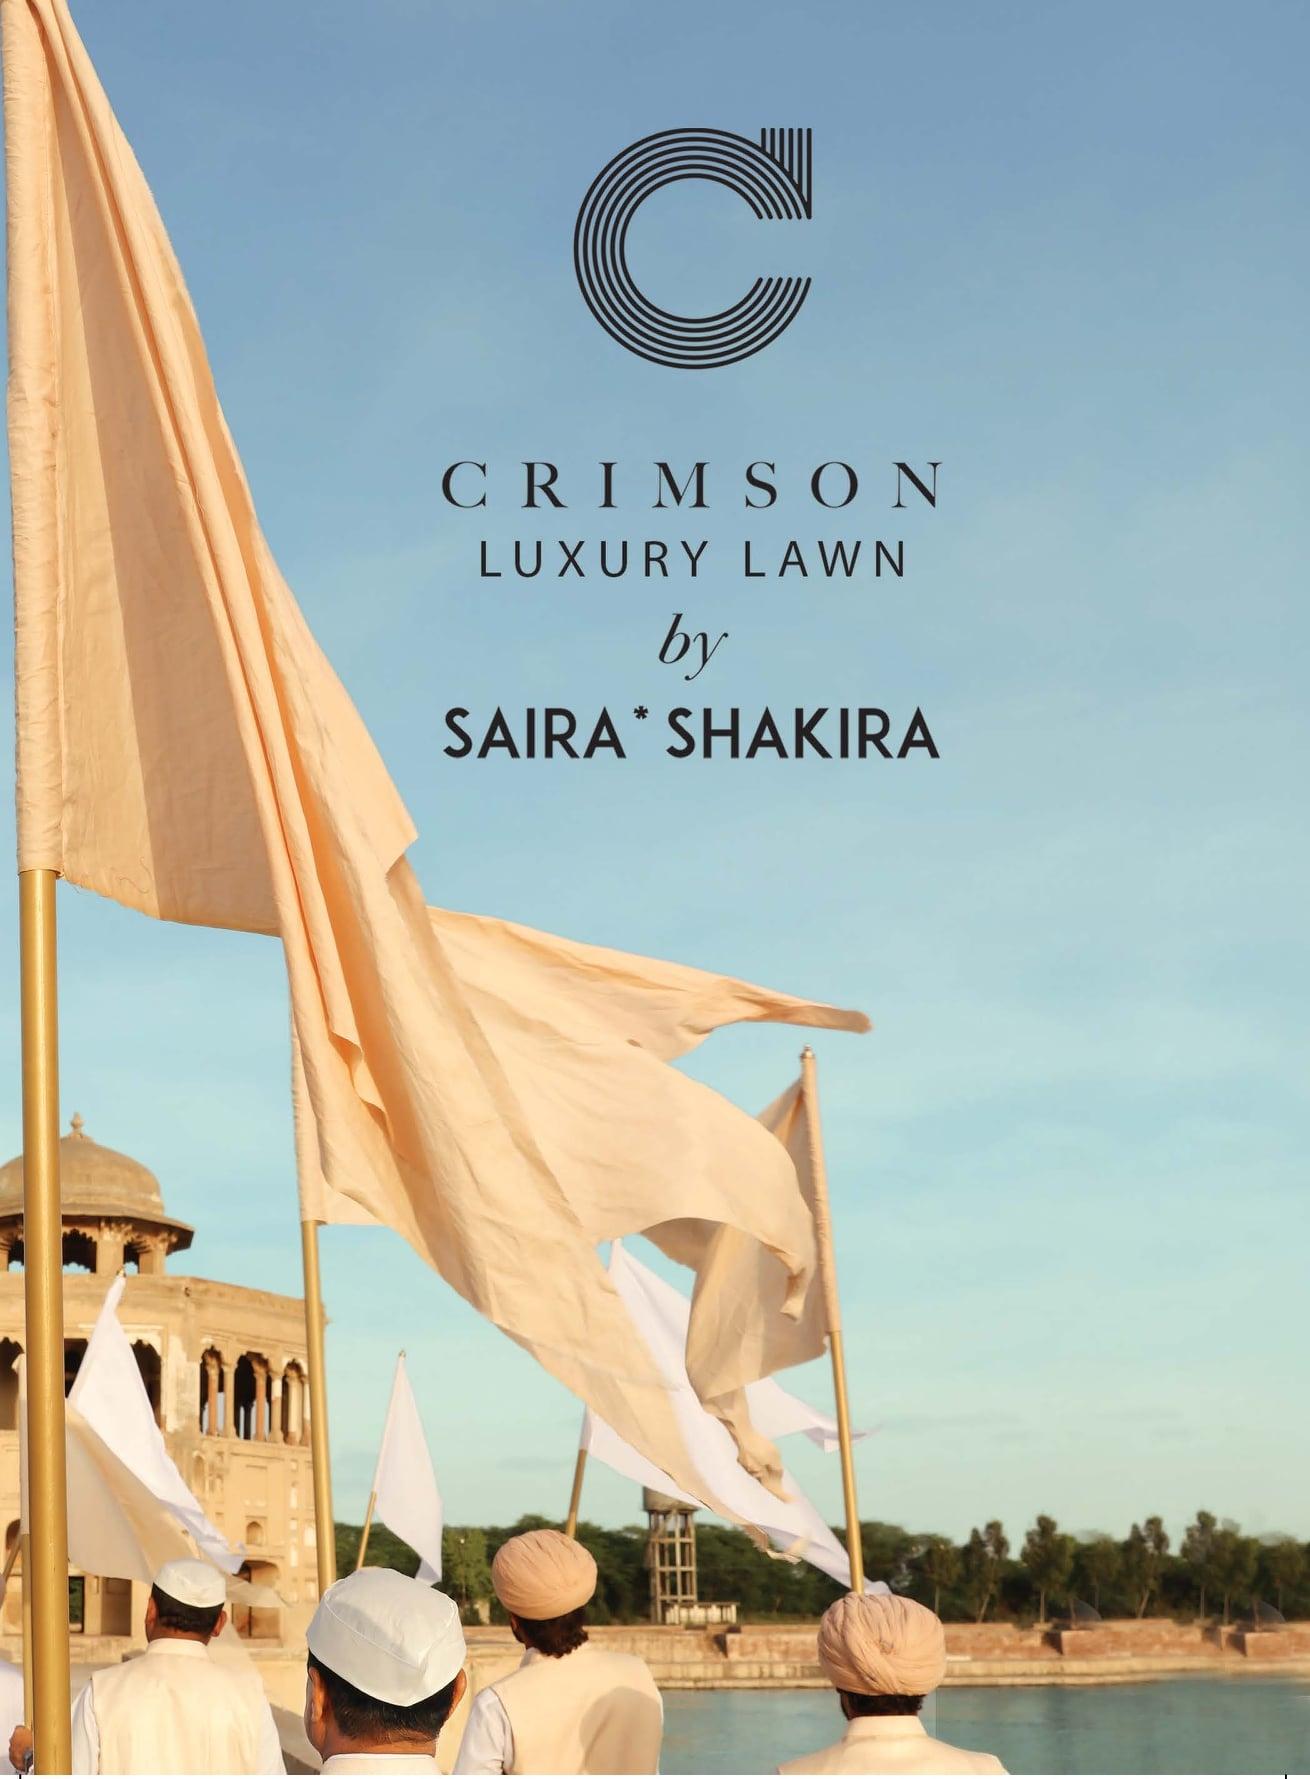 Rani Sahiba By Crimson Luxury Lawn'21